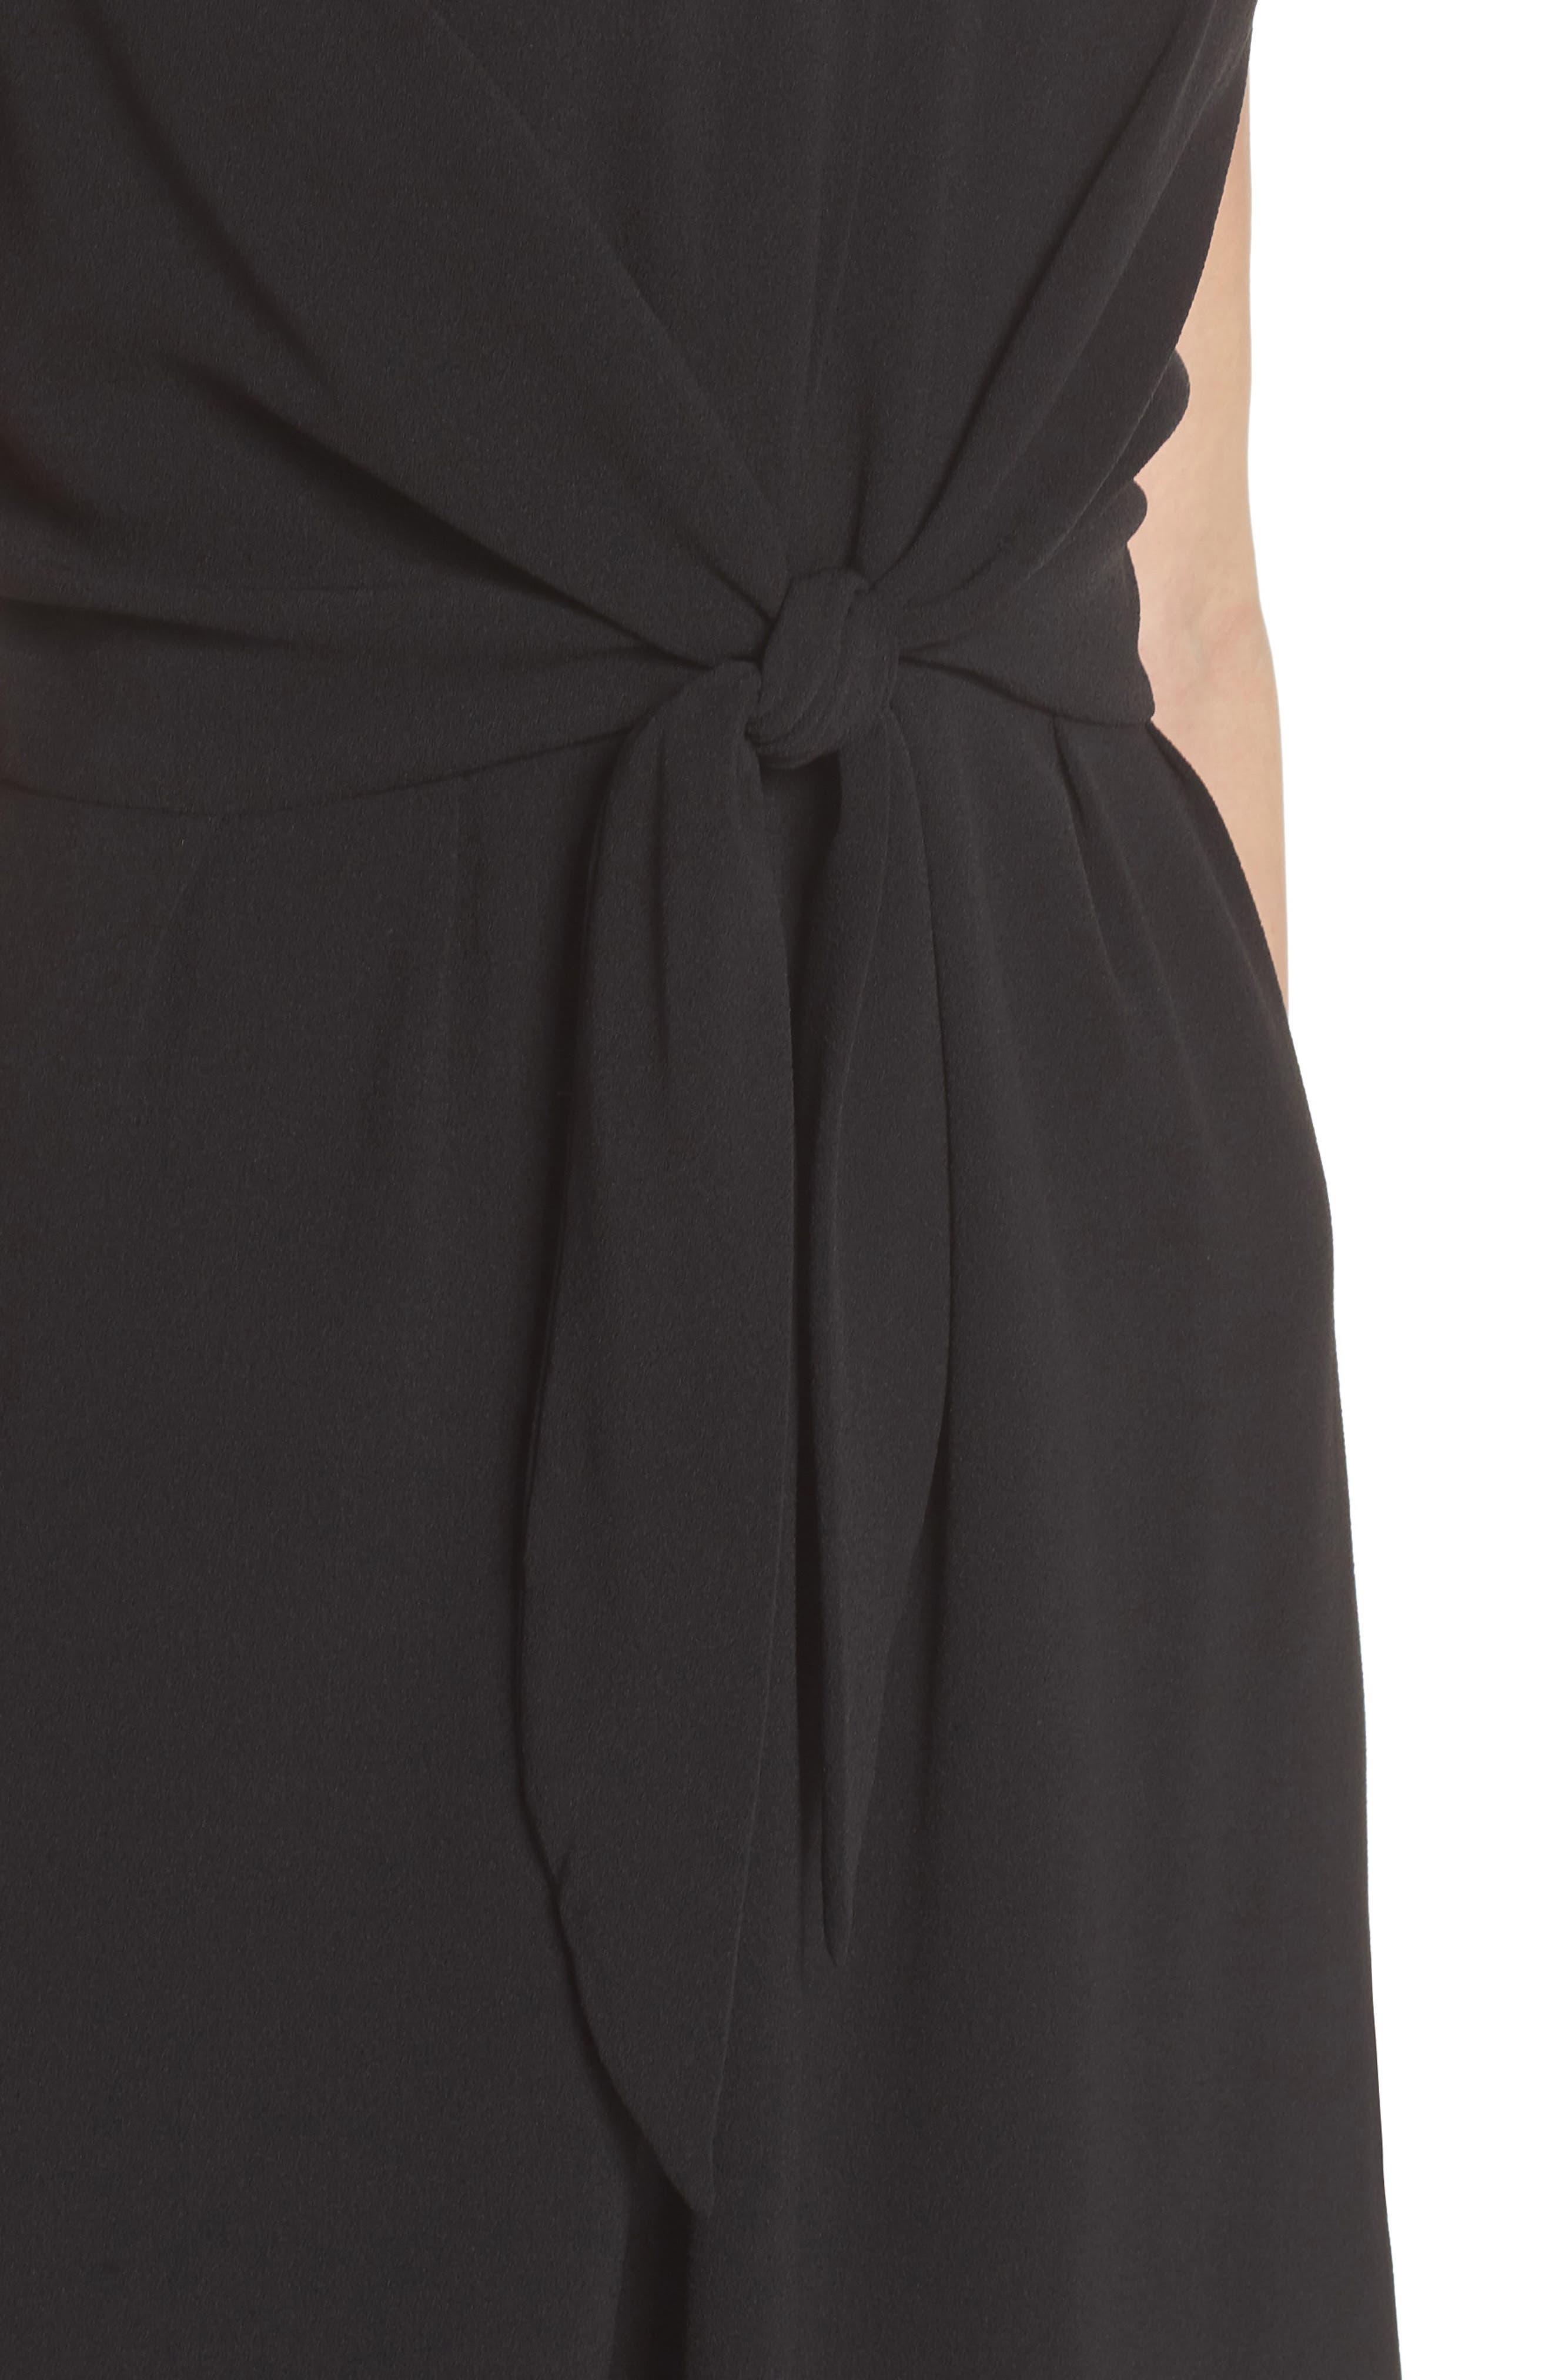 Tie Front Sheath Dress,                             Alternate thumbnail 4, color,                             001